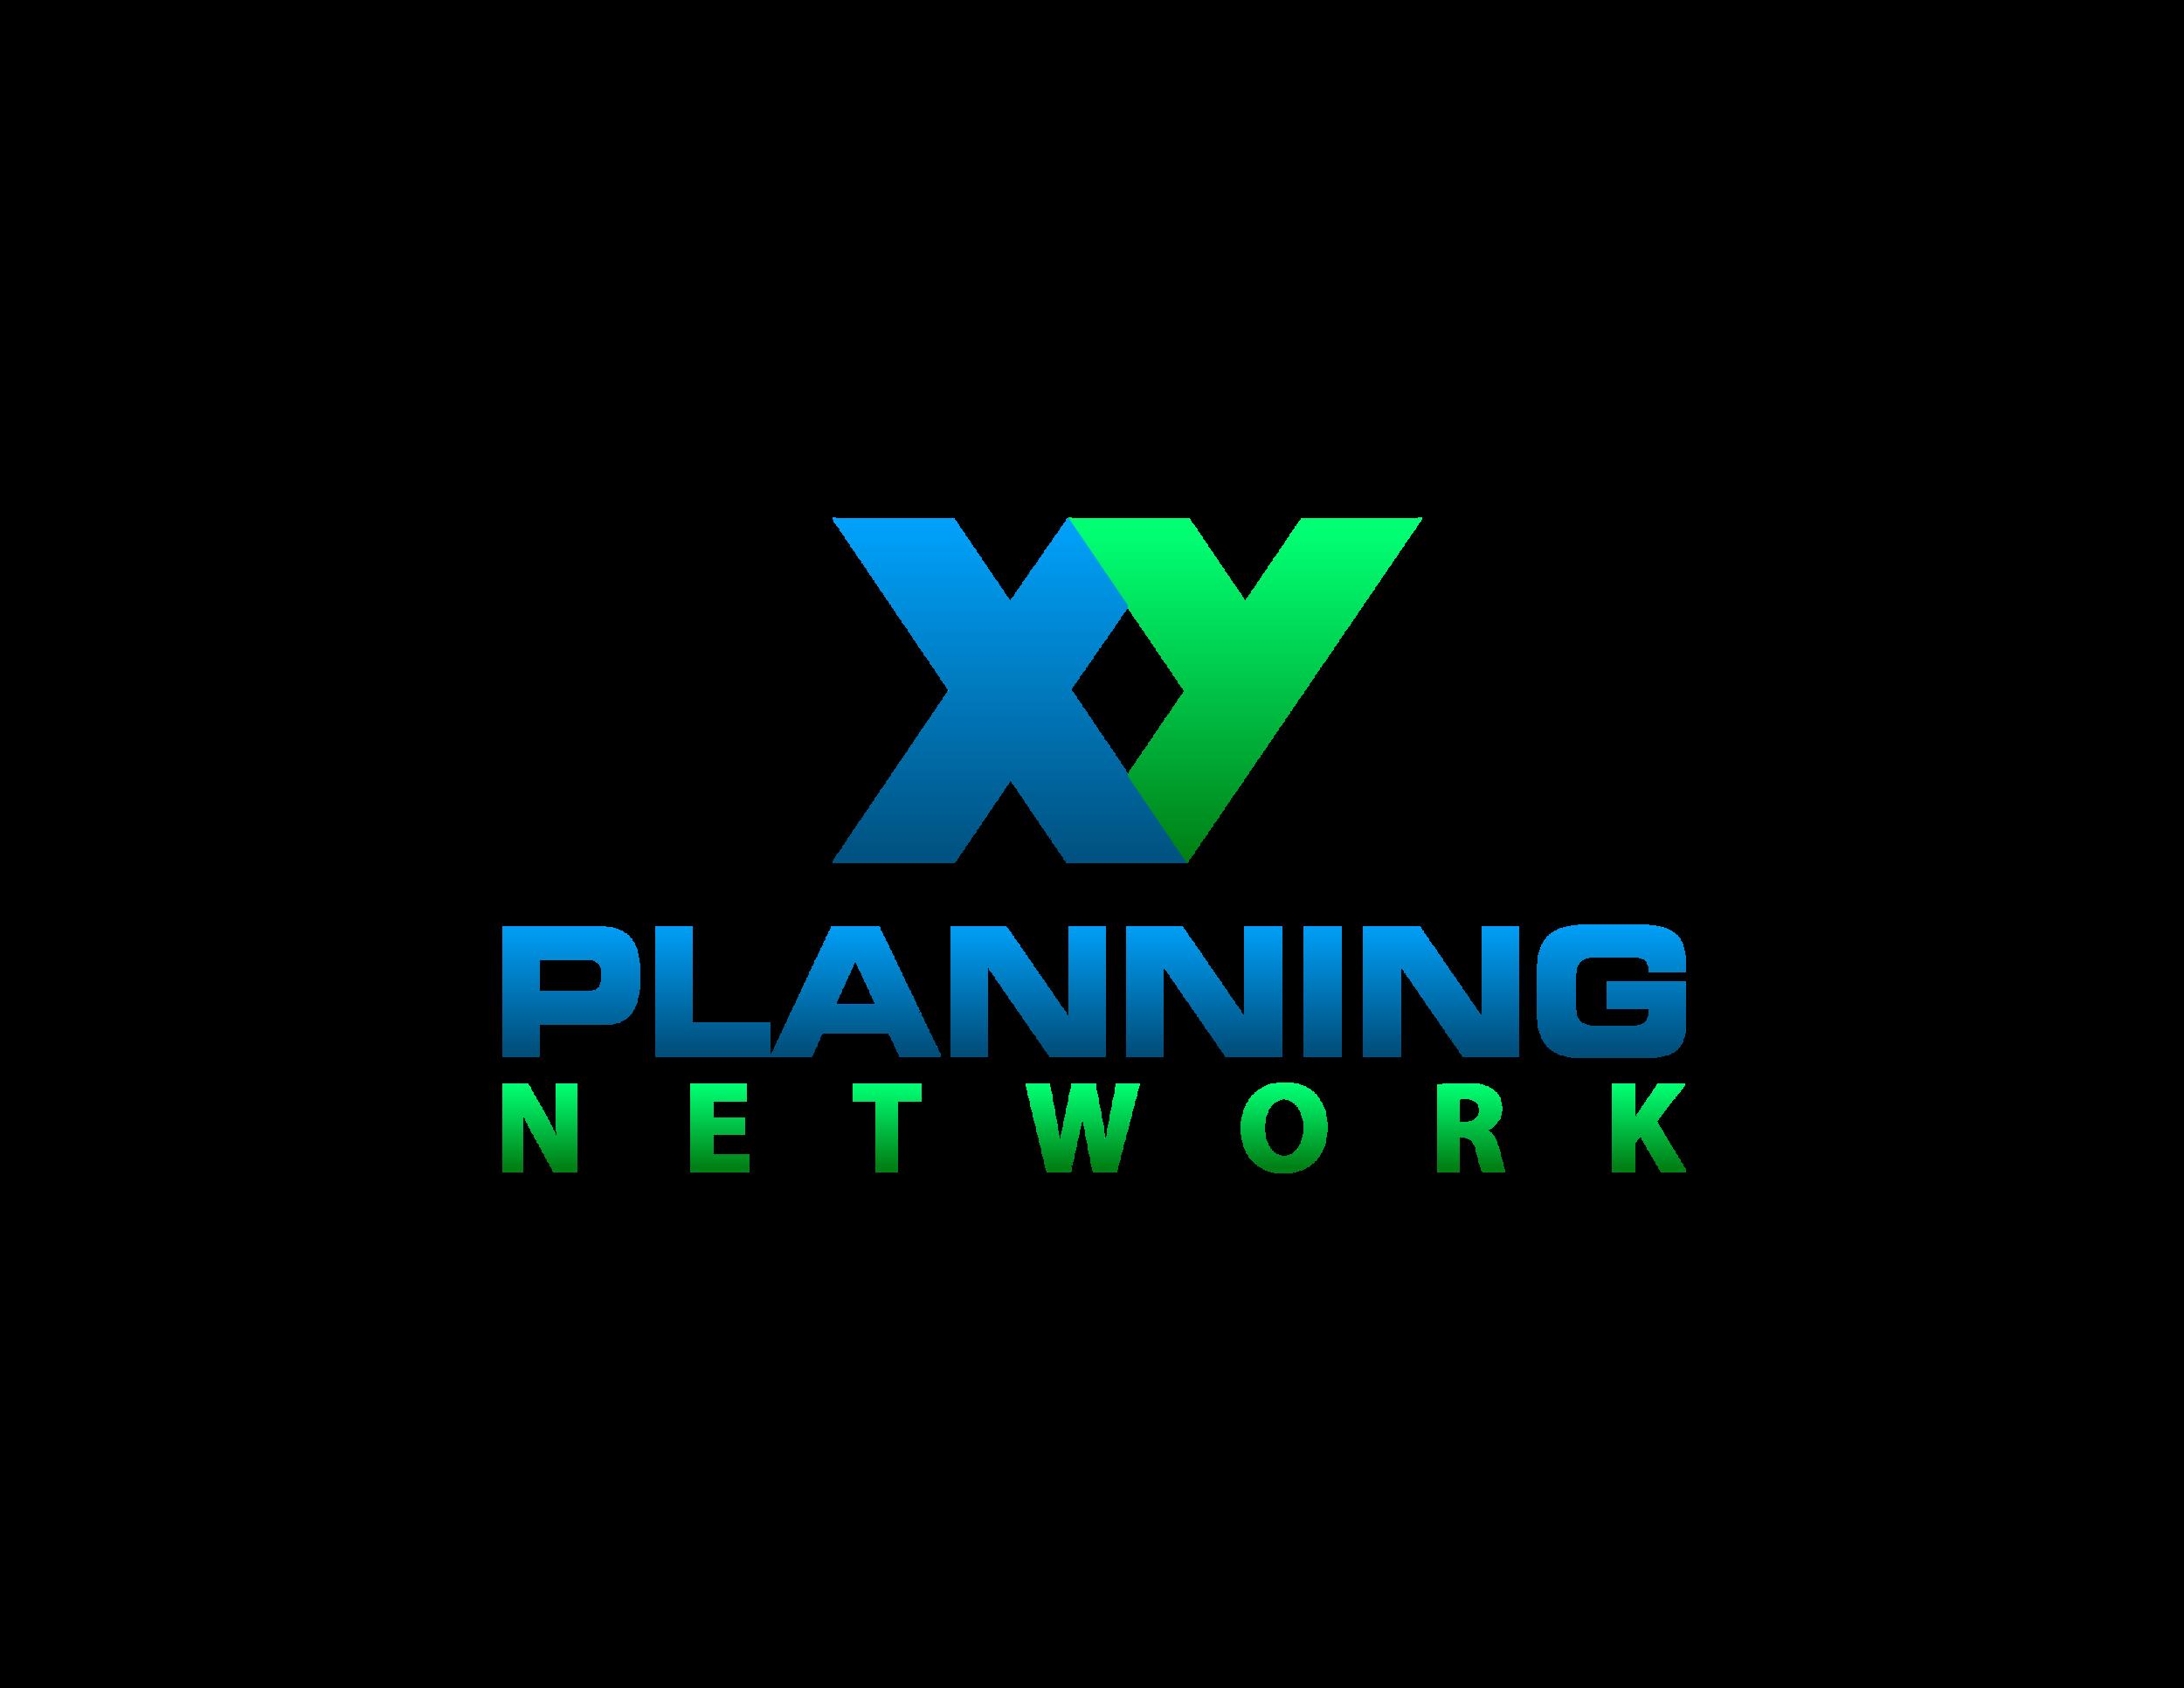 XYPN Logo Color_Version.png